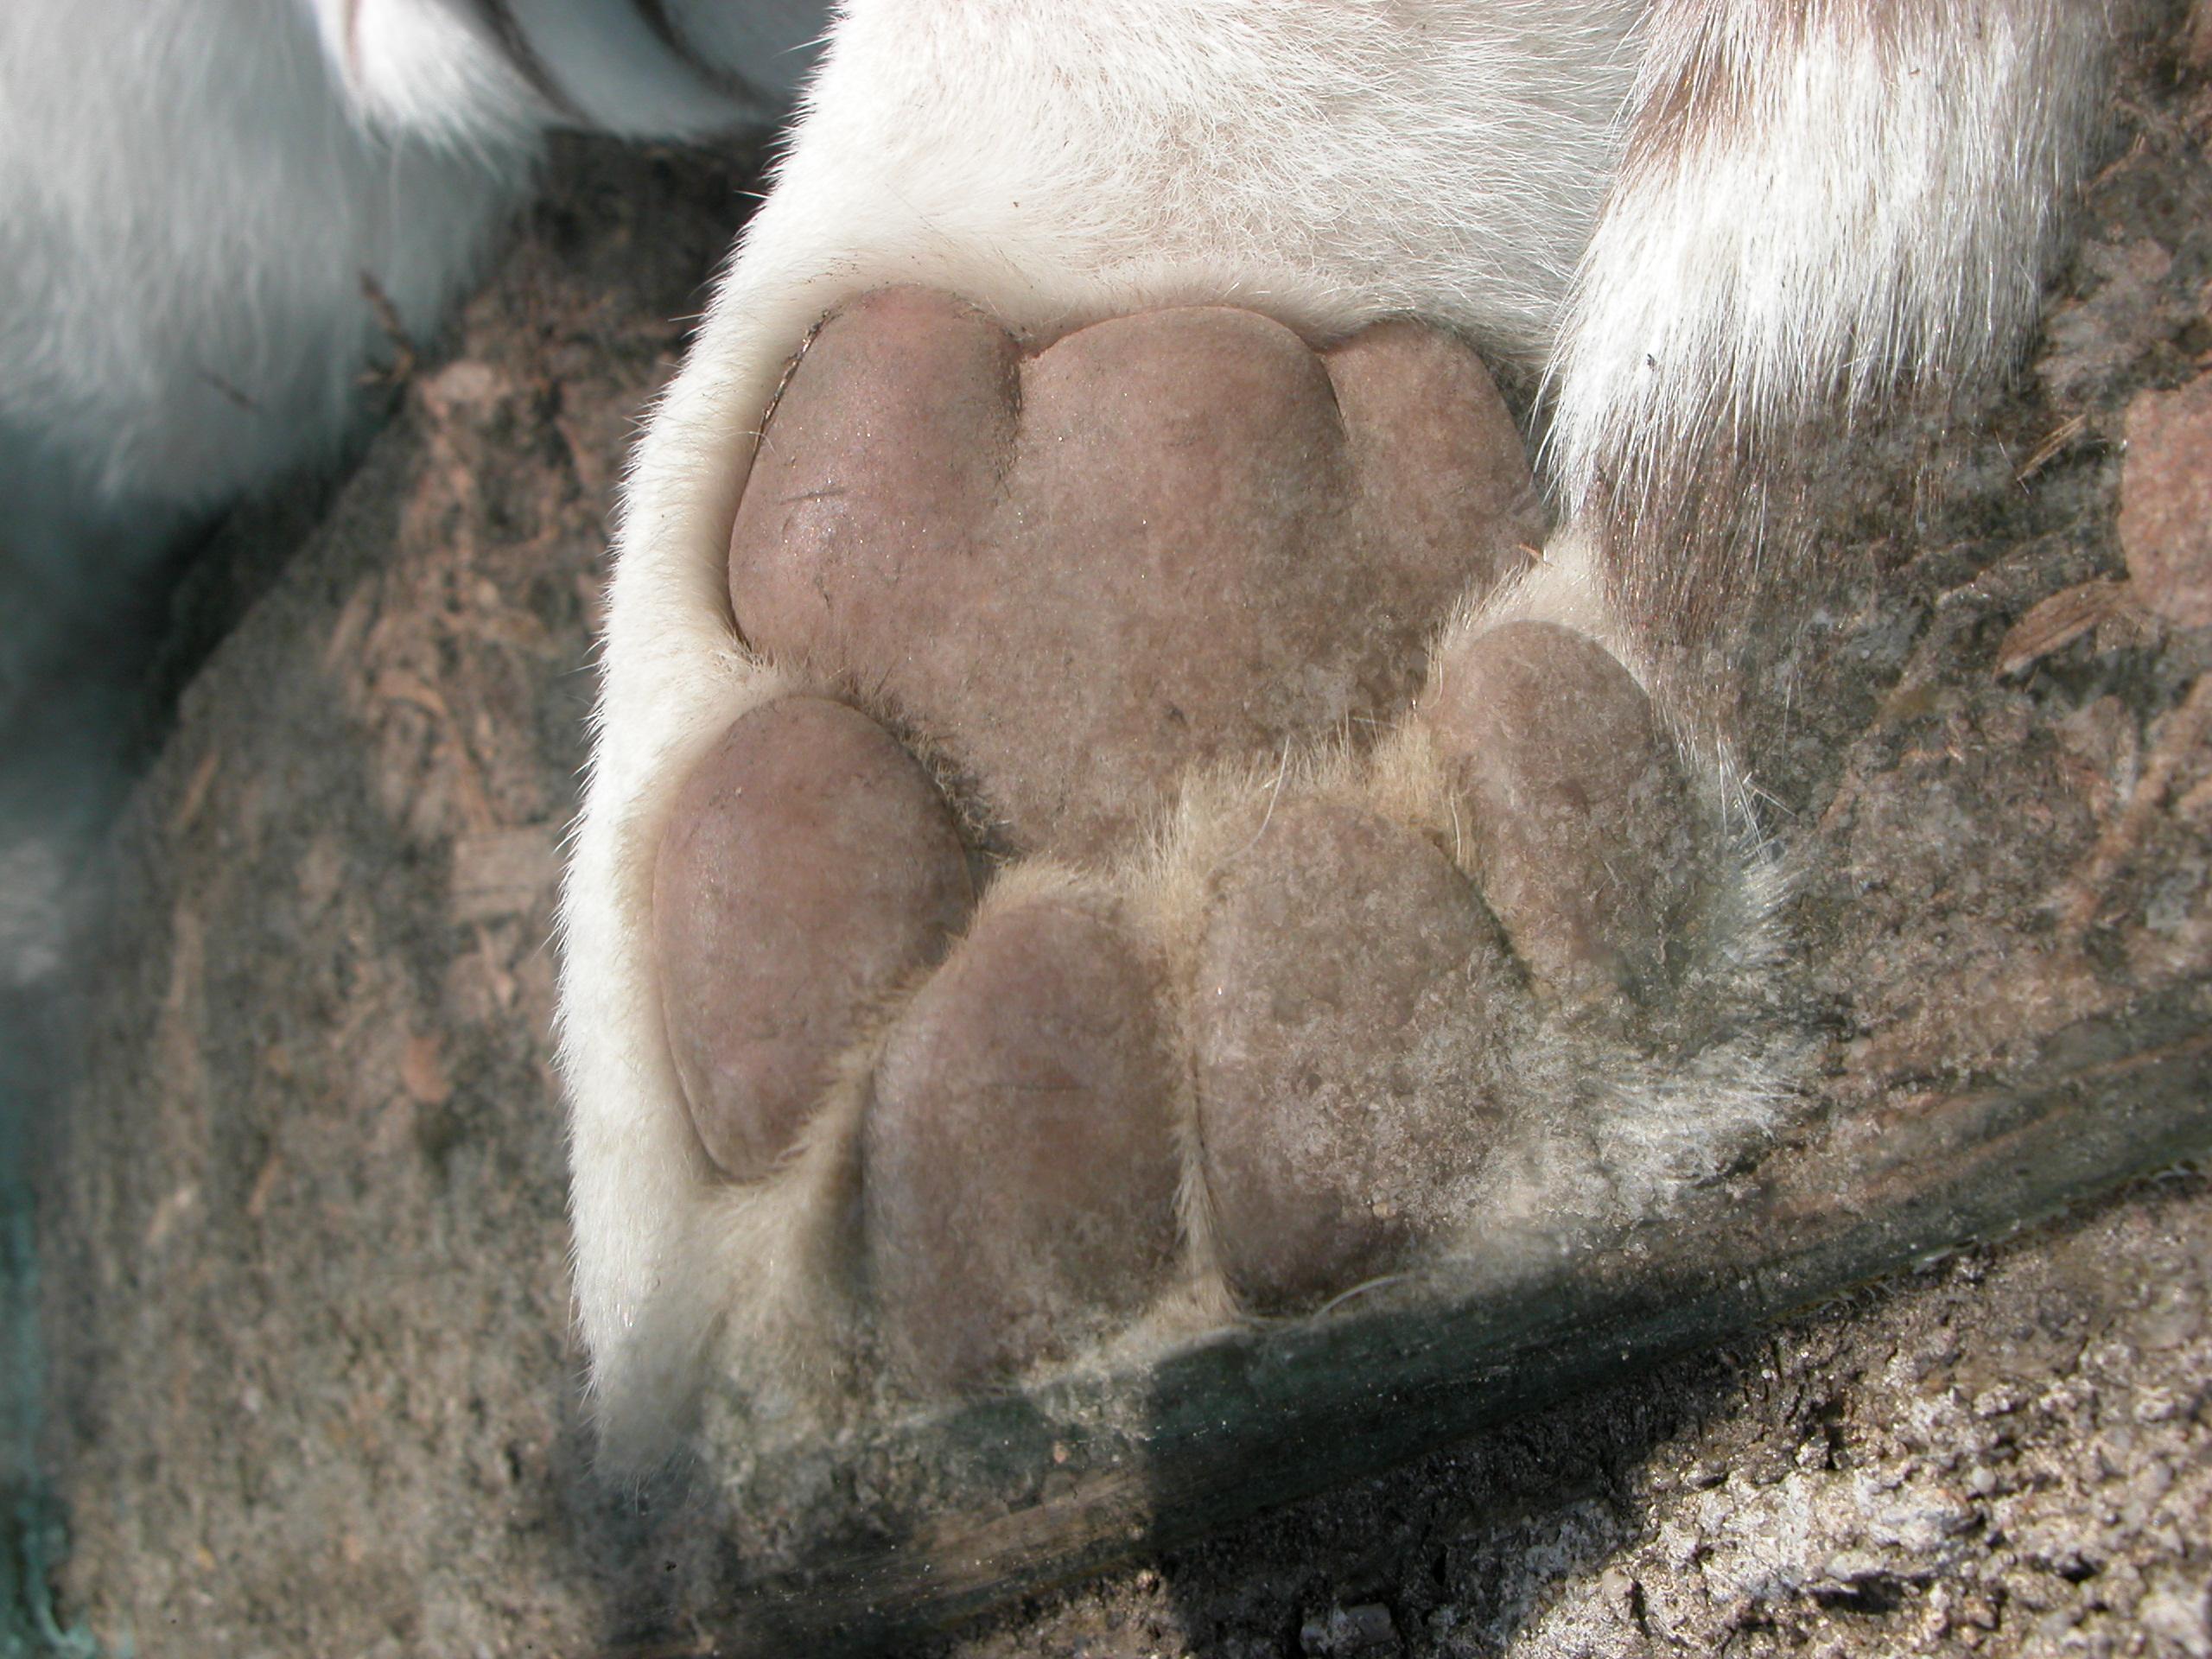 dog cat paw hair sole feet foot brown white fur